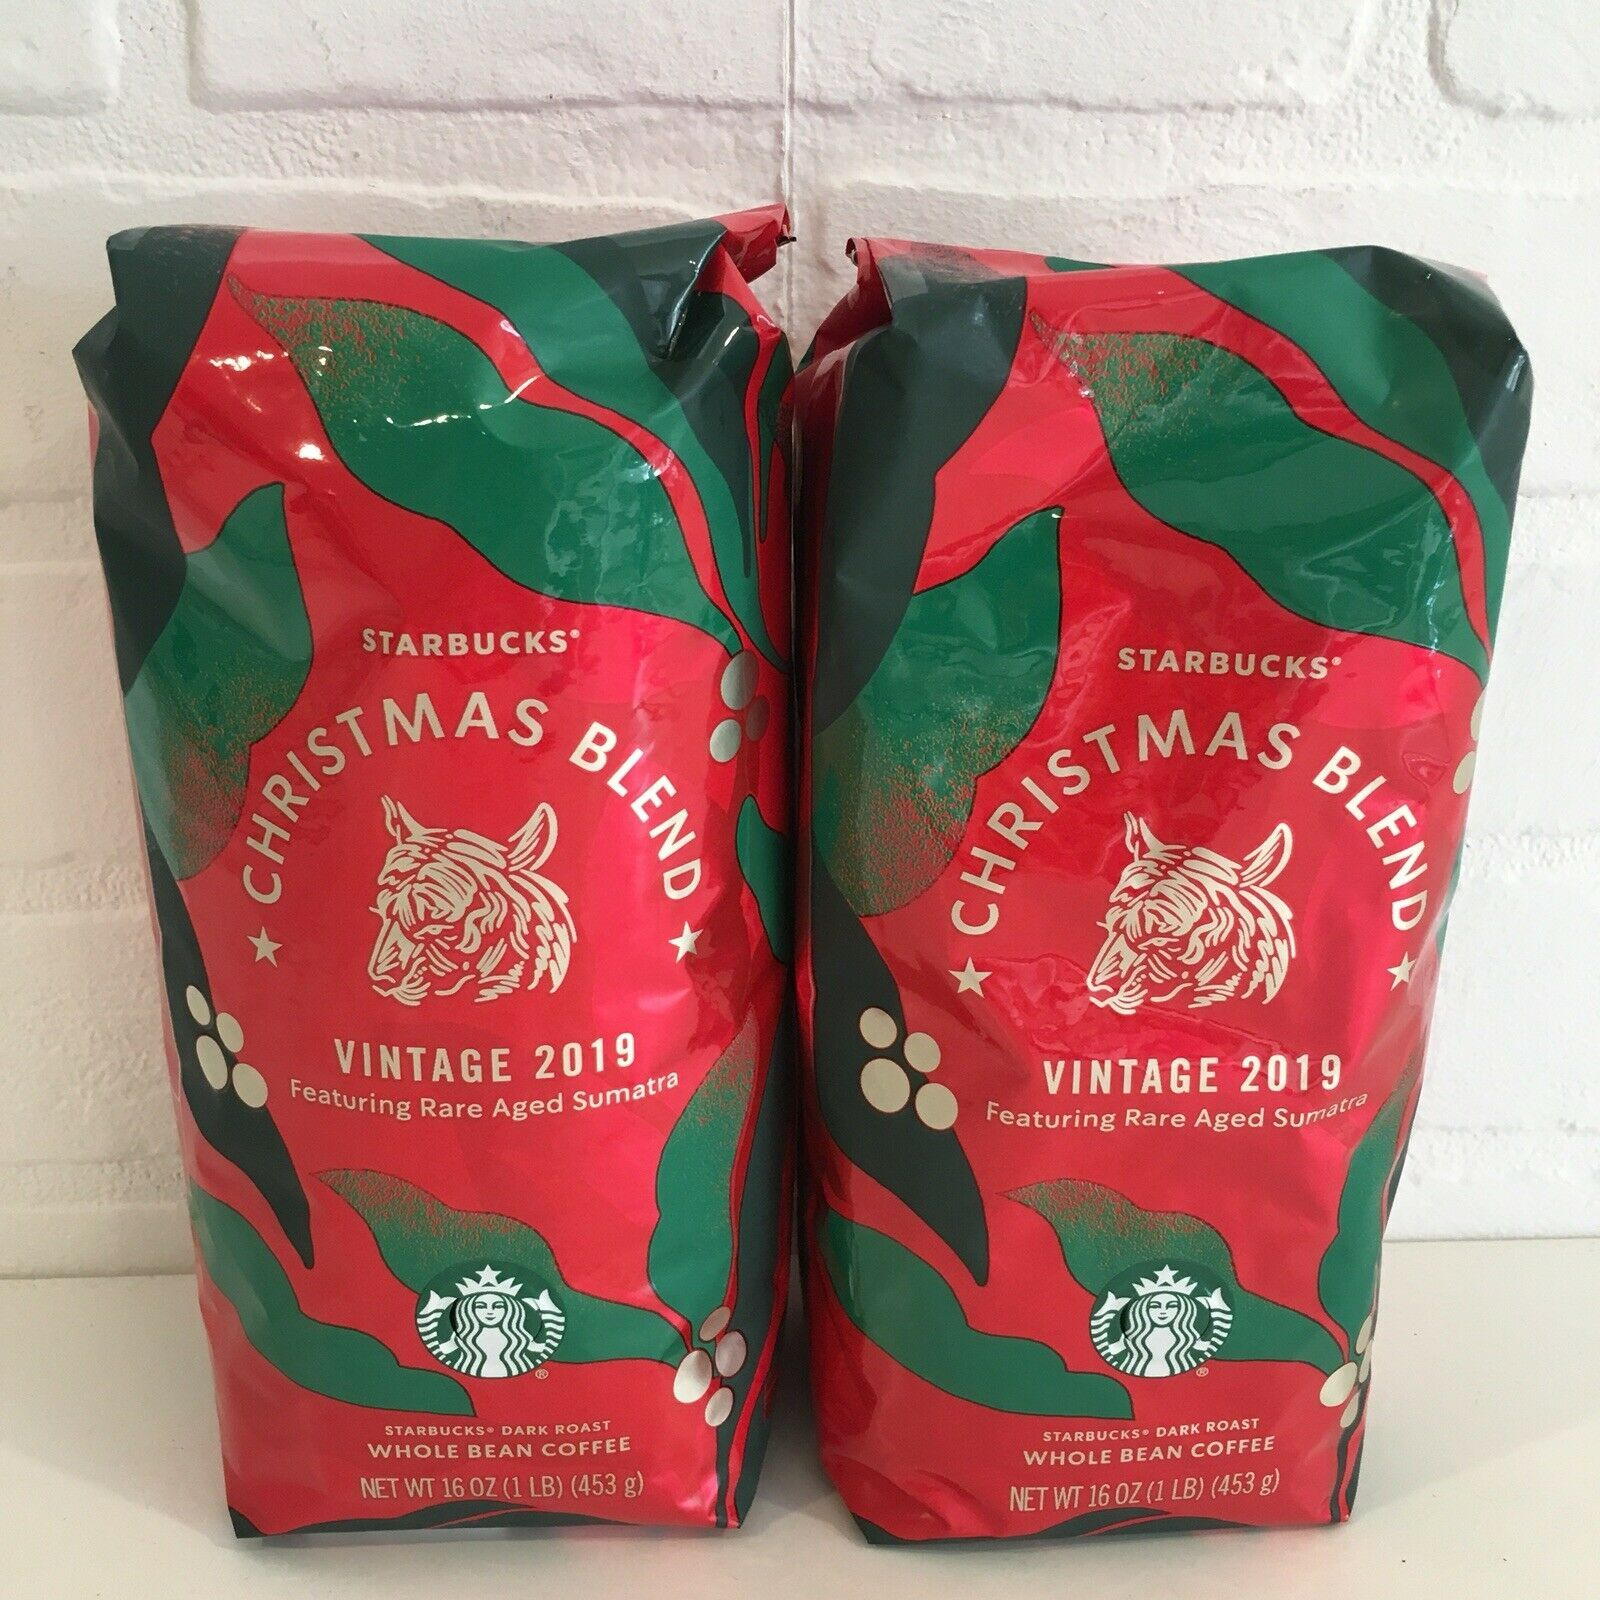 2 Sealed Bag Starbucks 2019 Christmas Blend Whole Bean Coffee Vintage 2lbs Rare Starbucks Coffee Drinks Coffee Best Starbucks Coffee